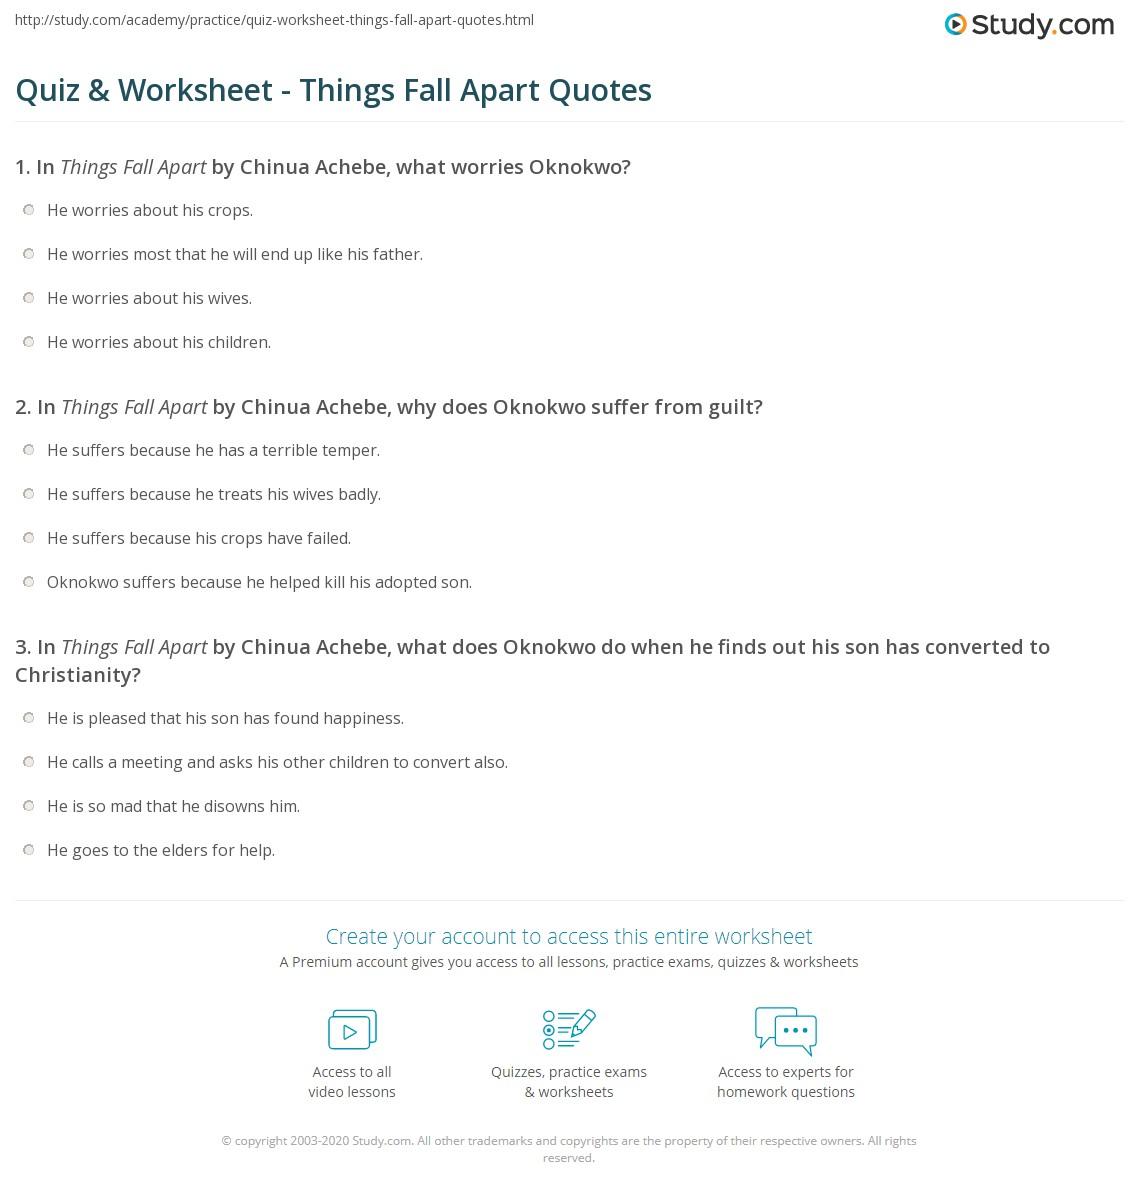 Quiz & Worksheet - Things Fall Apart Quotes | Study.com